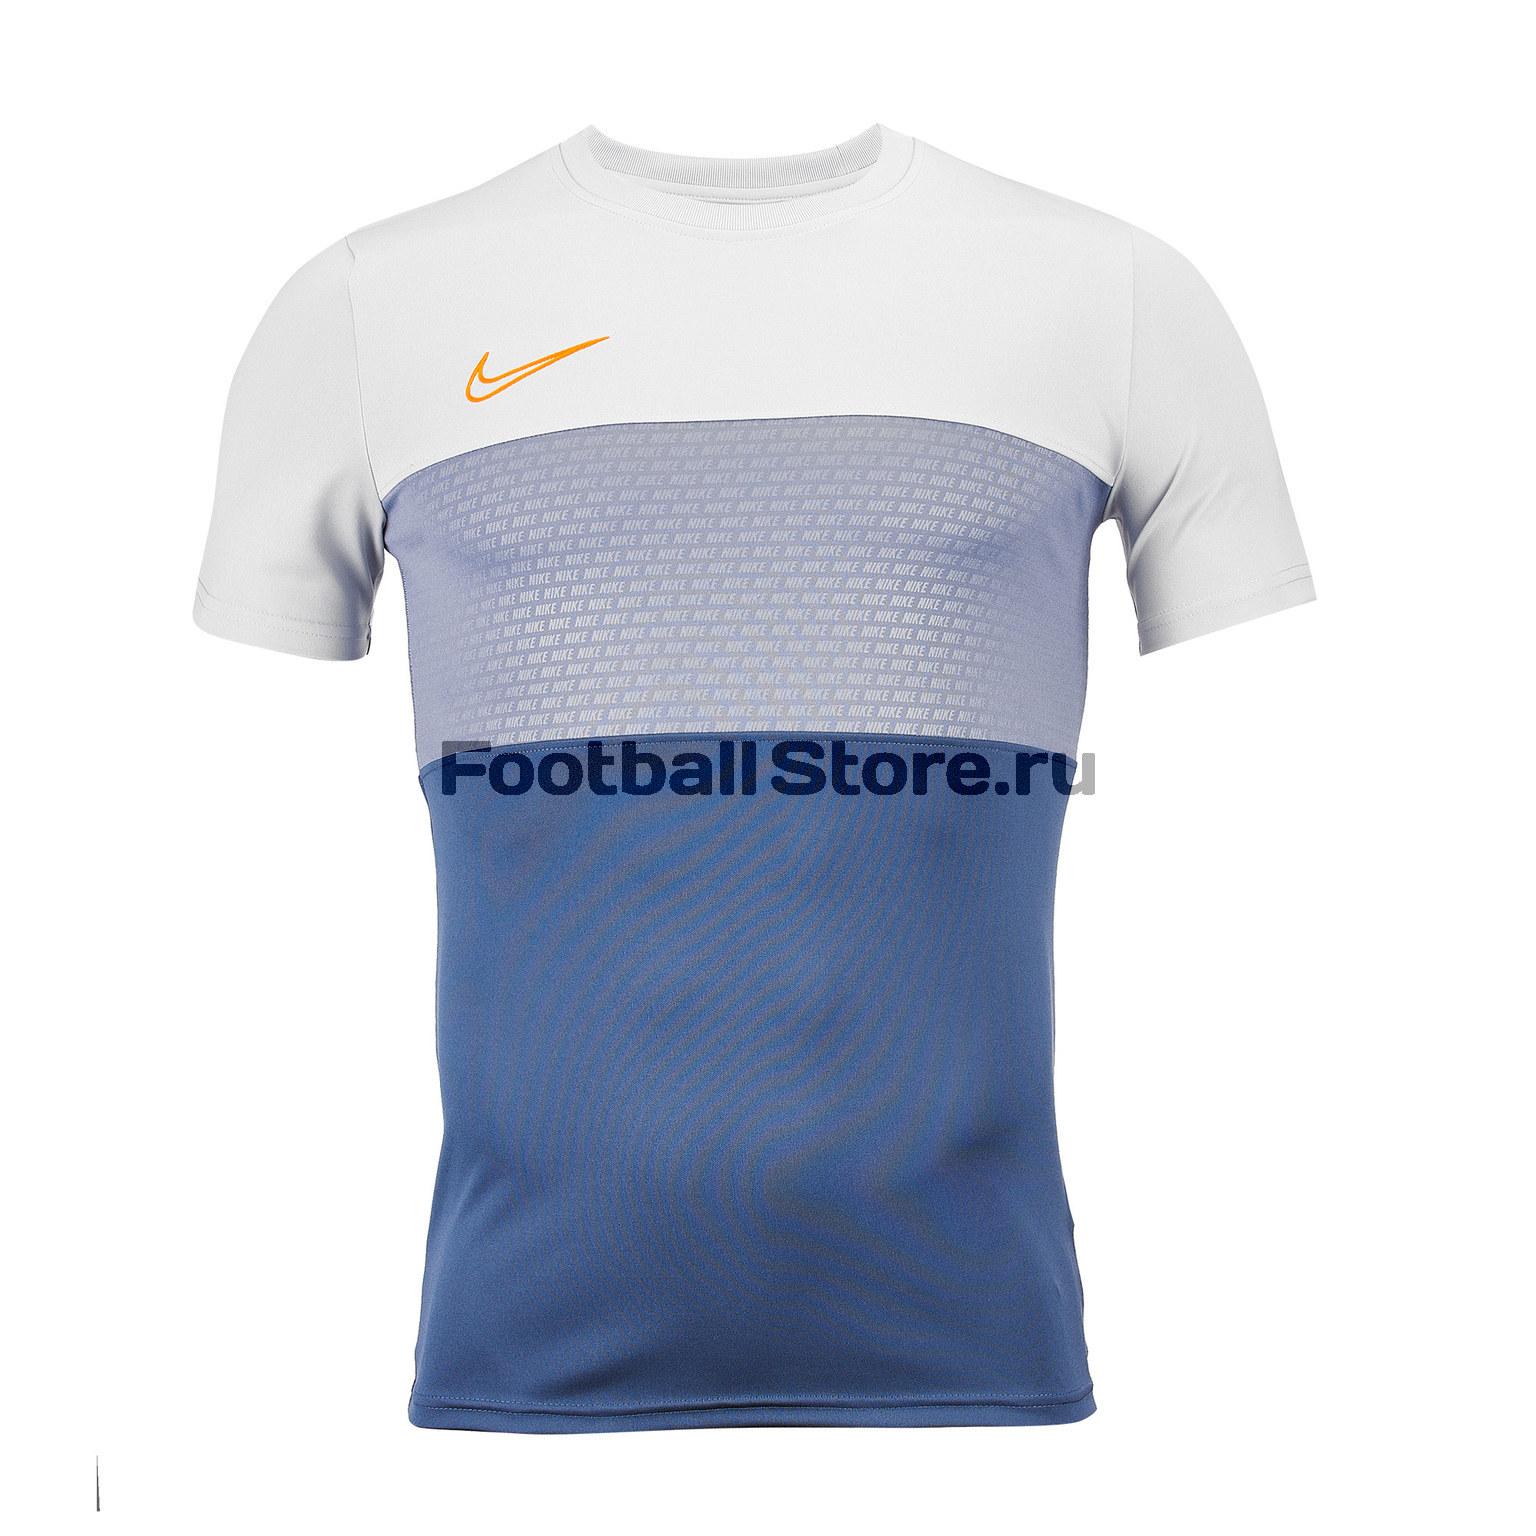 Футболка тренировочная Nike Dry Academy Top SS GX AJ9998-012 nike футболка для мальчика nike df cool ss top yth nike